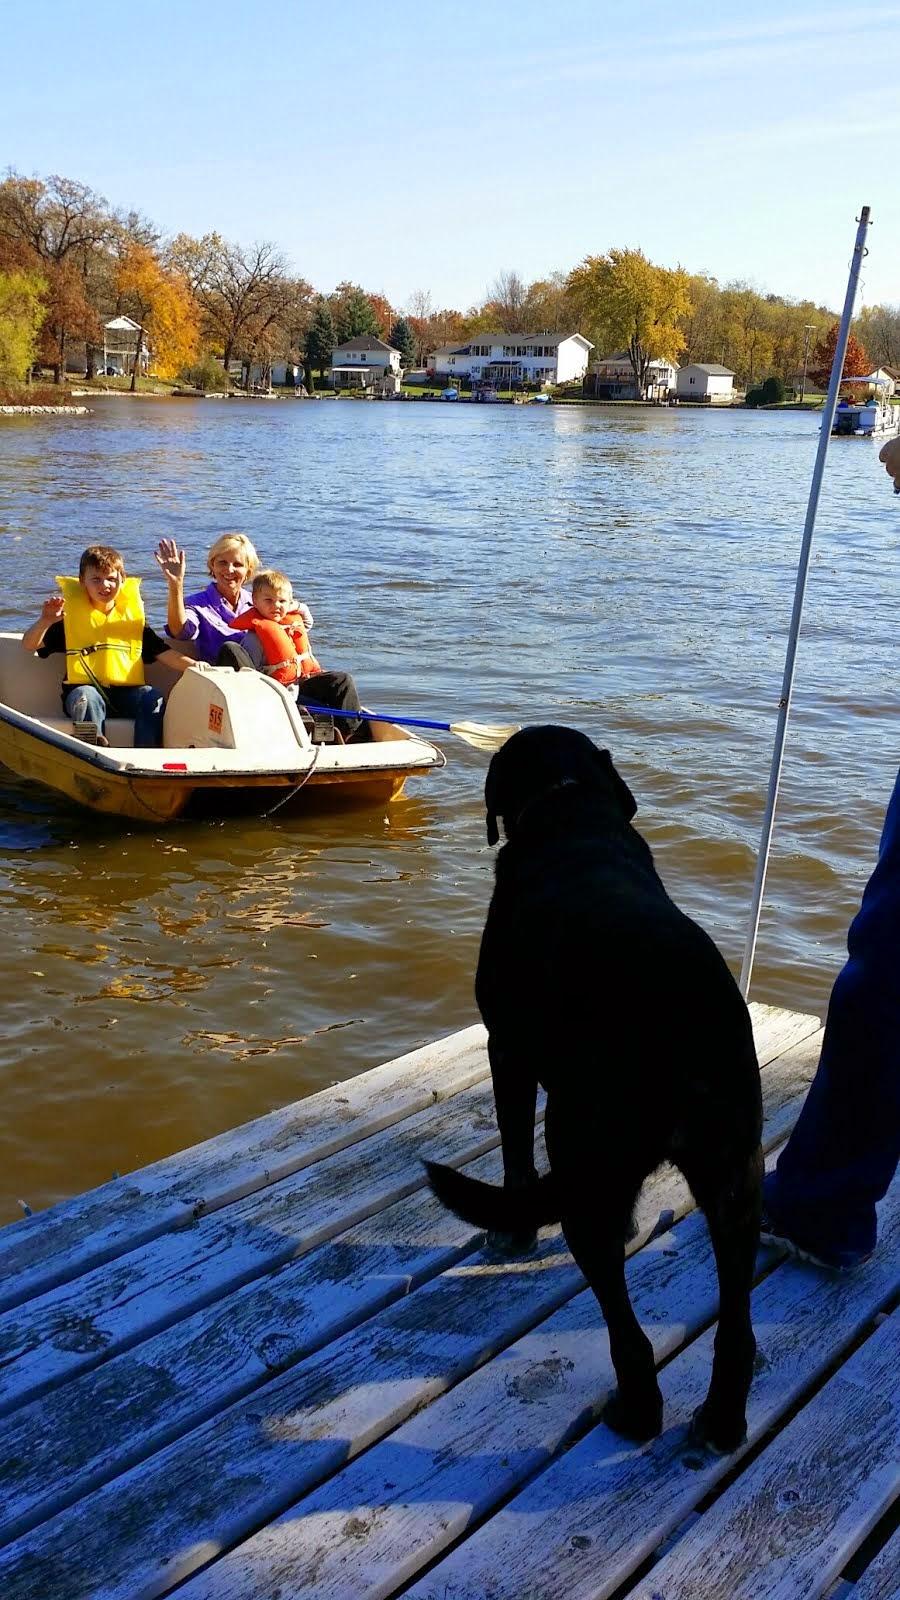 Taking a Fall Boat Ride on Lake Dalecarlia